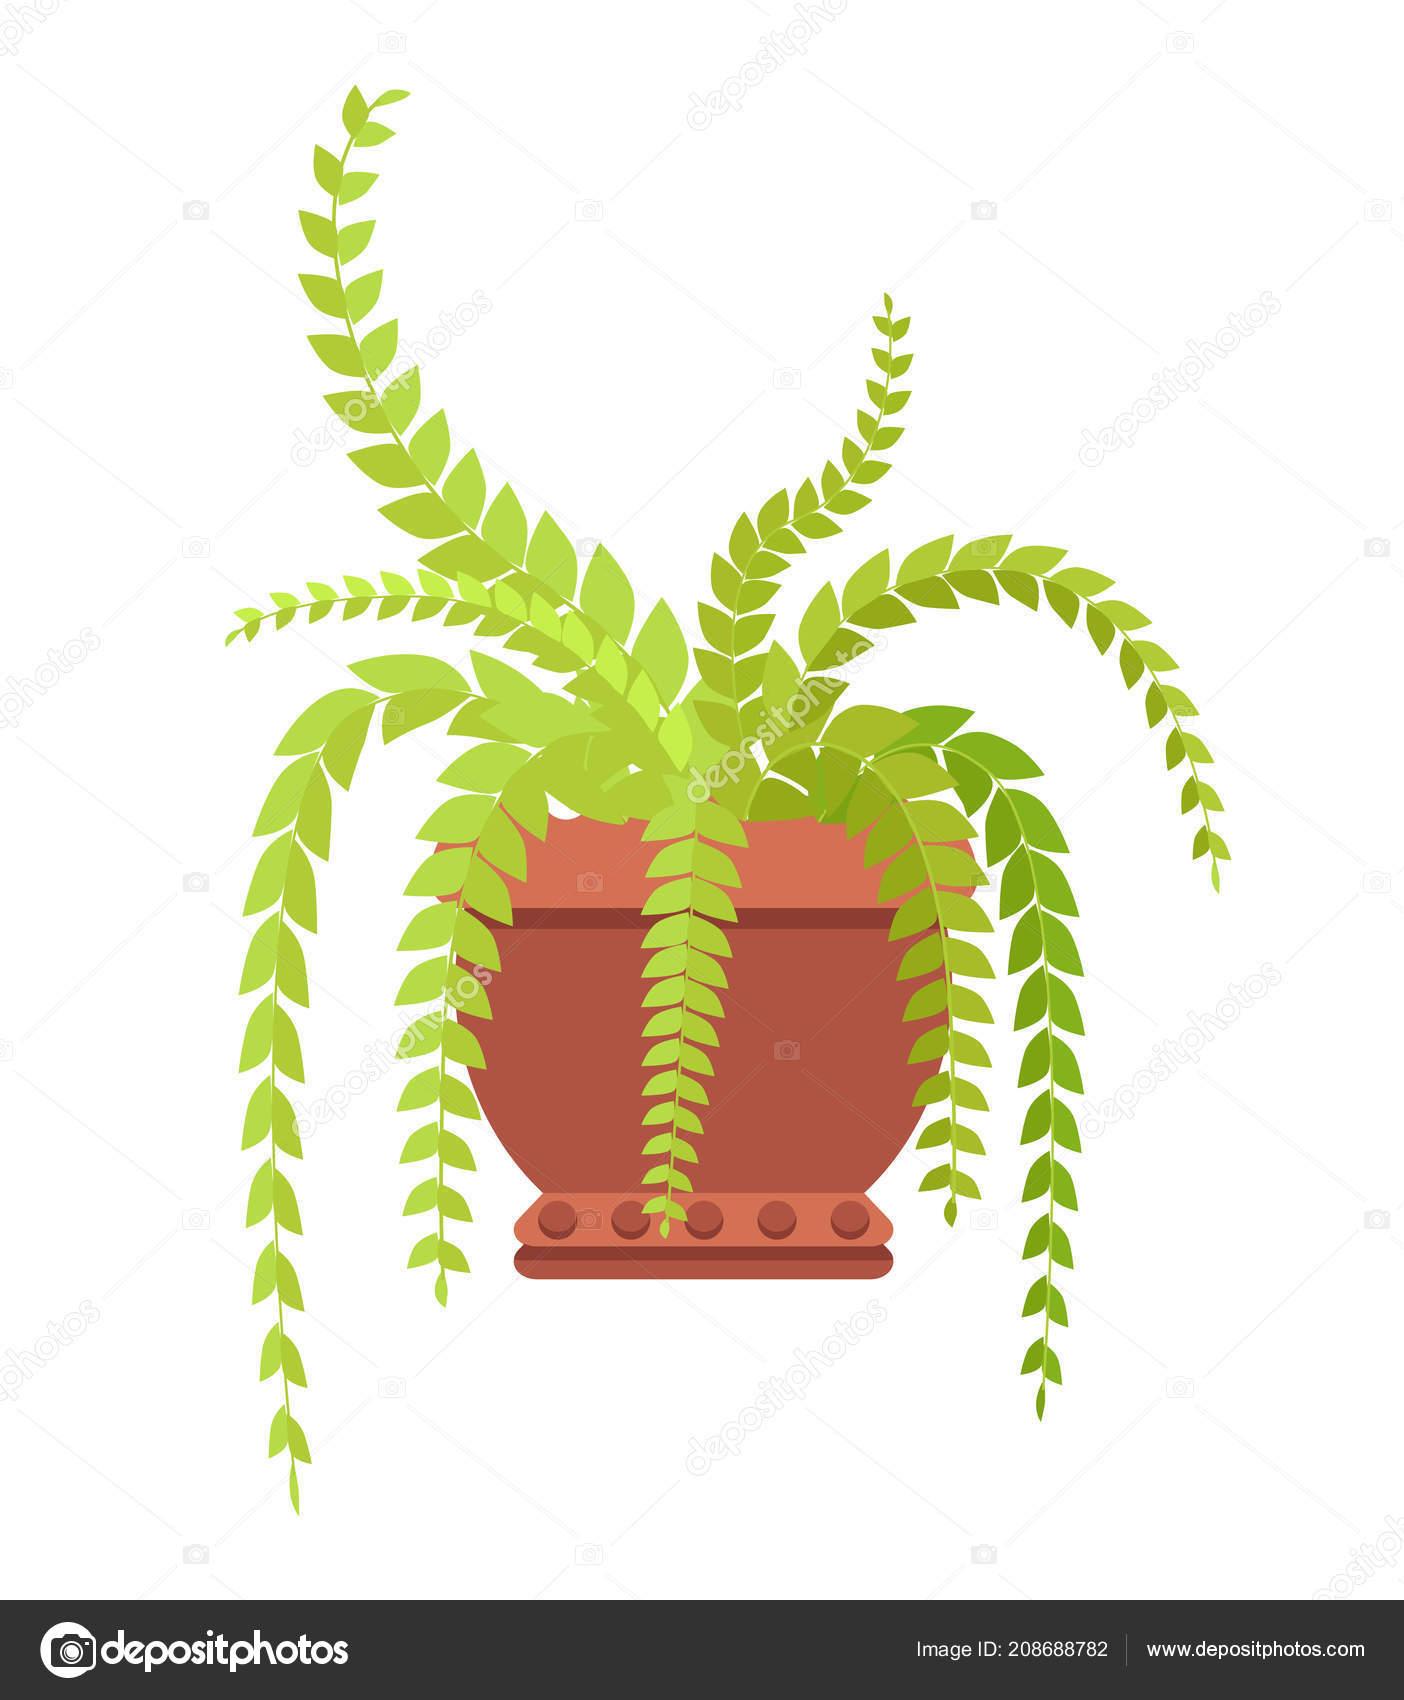 Fern Indoor Plant with Long Leaves in Big Clay Pot — Stock Vector on fern flowering shrubs, fern variety, fern fiddleheads with brown scales, fern id, fern scientific name, fern design, fern identification guide, fern foliage, fern container gardening, fern bonsai, fern foxtail lily, fern care, fern identification by leaf, fern baskets, fern propagation, fern growing conditions, fern assortment, fern girl, fern diagram, fern plants,